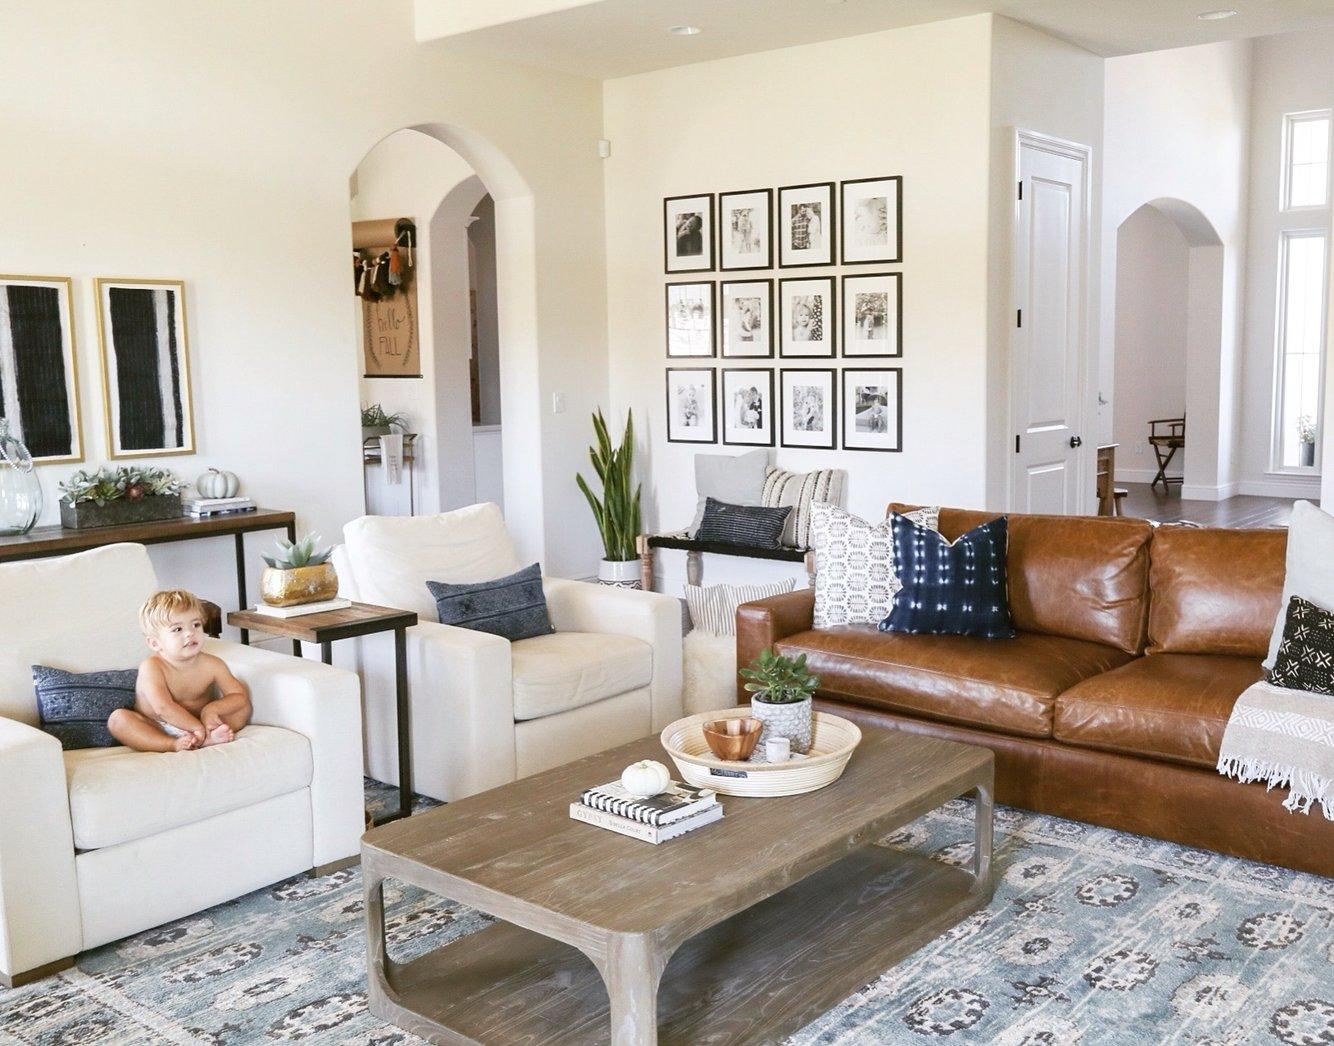 10 Lovable Leather Sofa Living Room Ideas living room ideas with leather sofas beauteous fdcccdeeedfa 2021